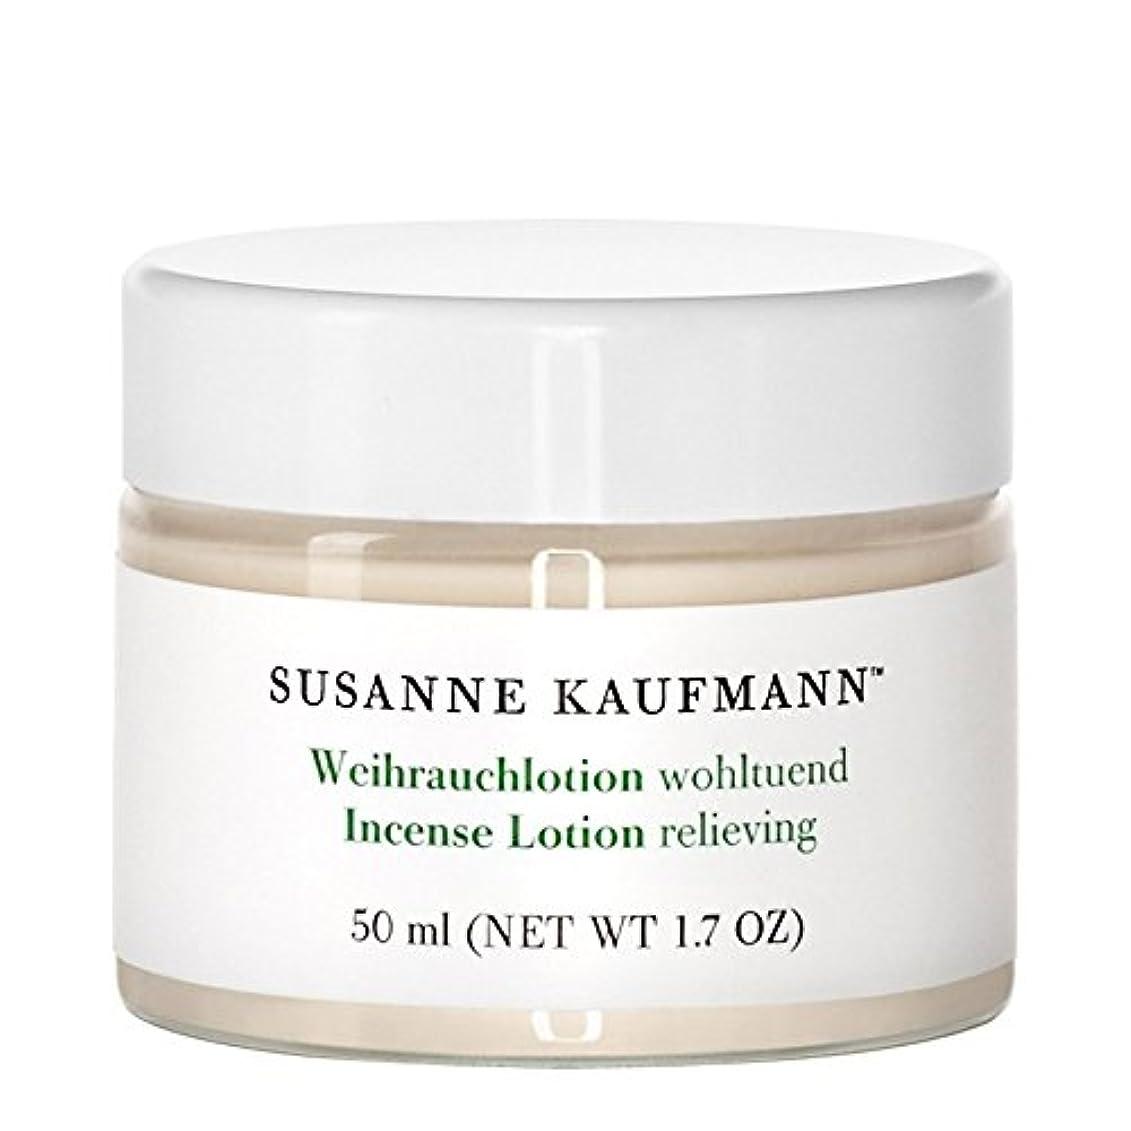 Susanne Kaufmann Incense Lotion 50ml - スザンヌカウフマン香ローション50ミリリットル [並行輸入品]